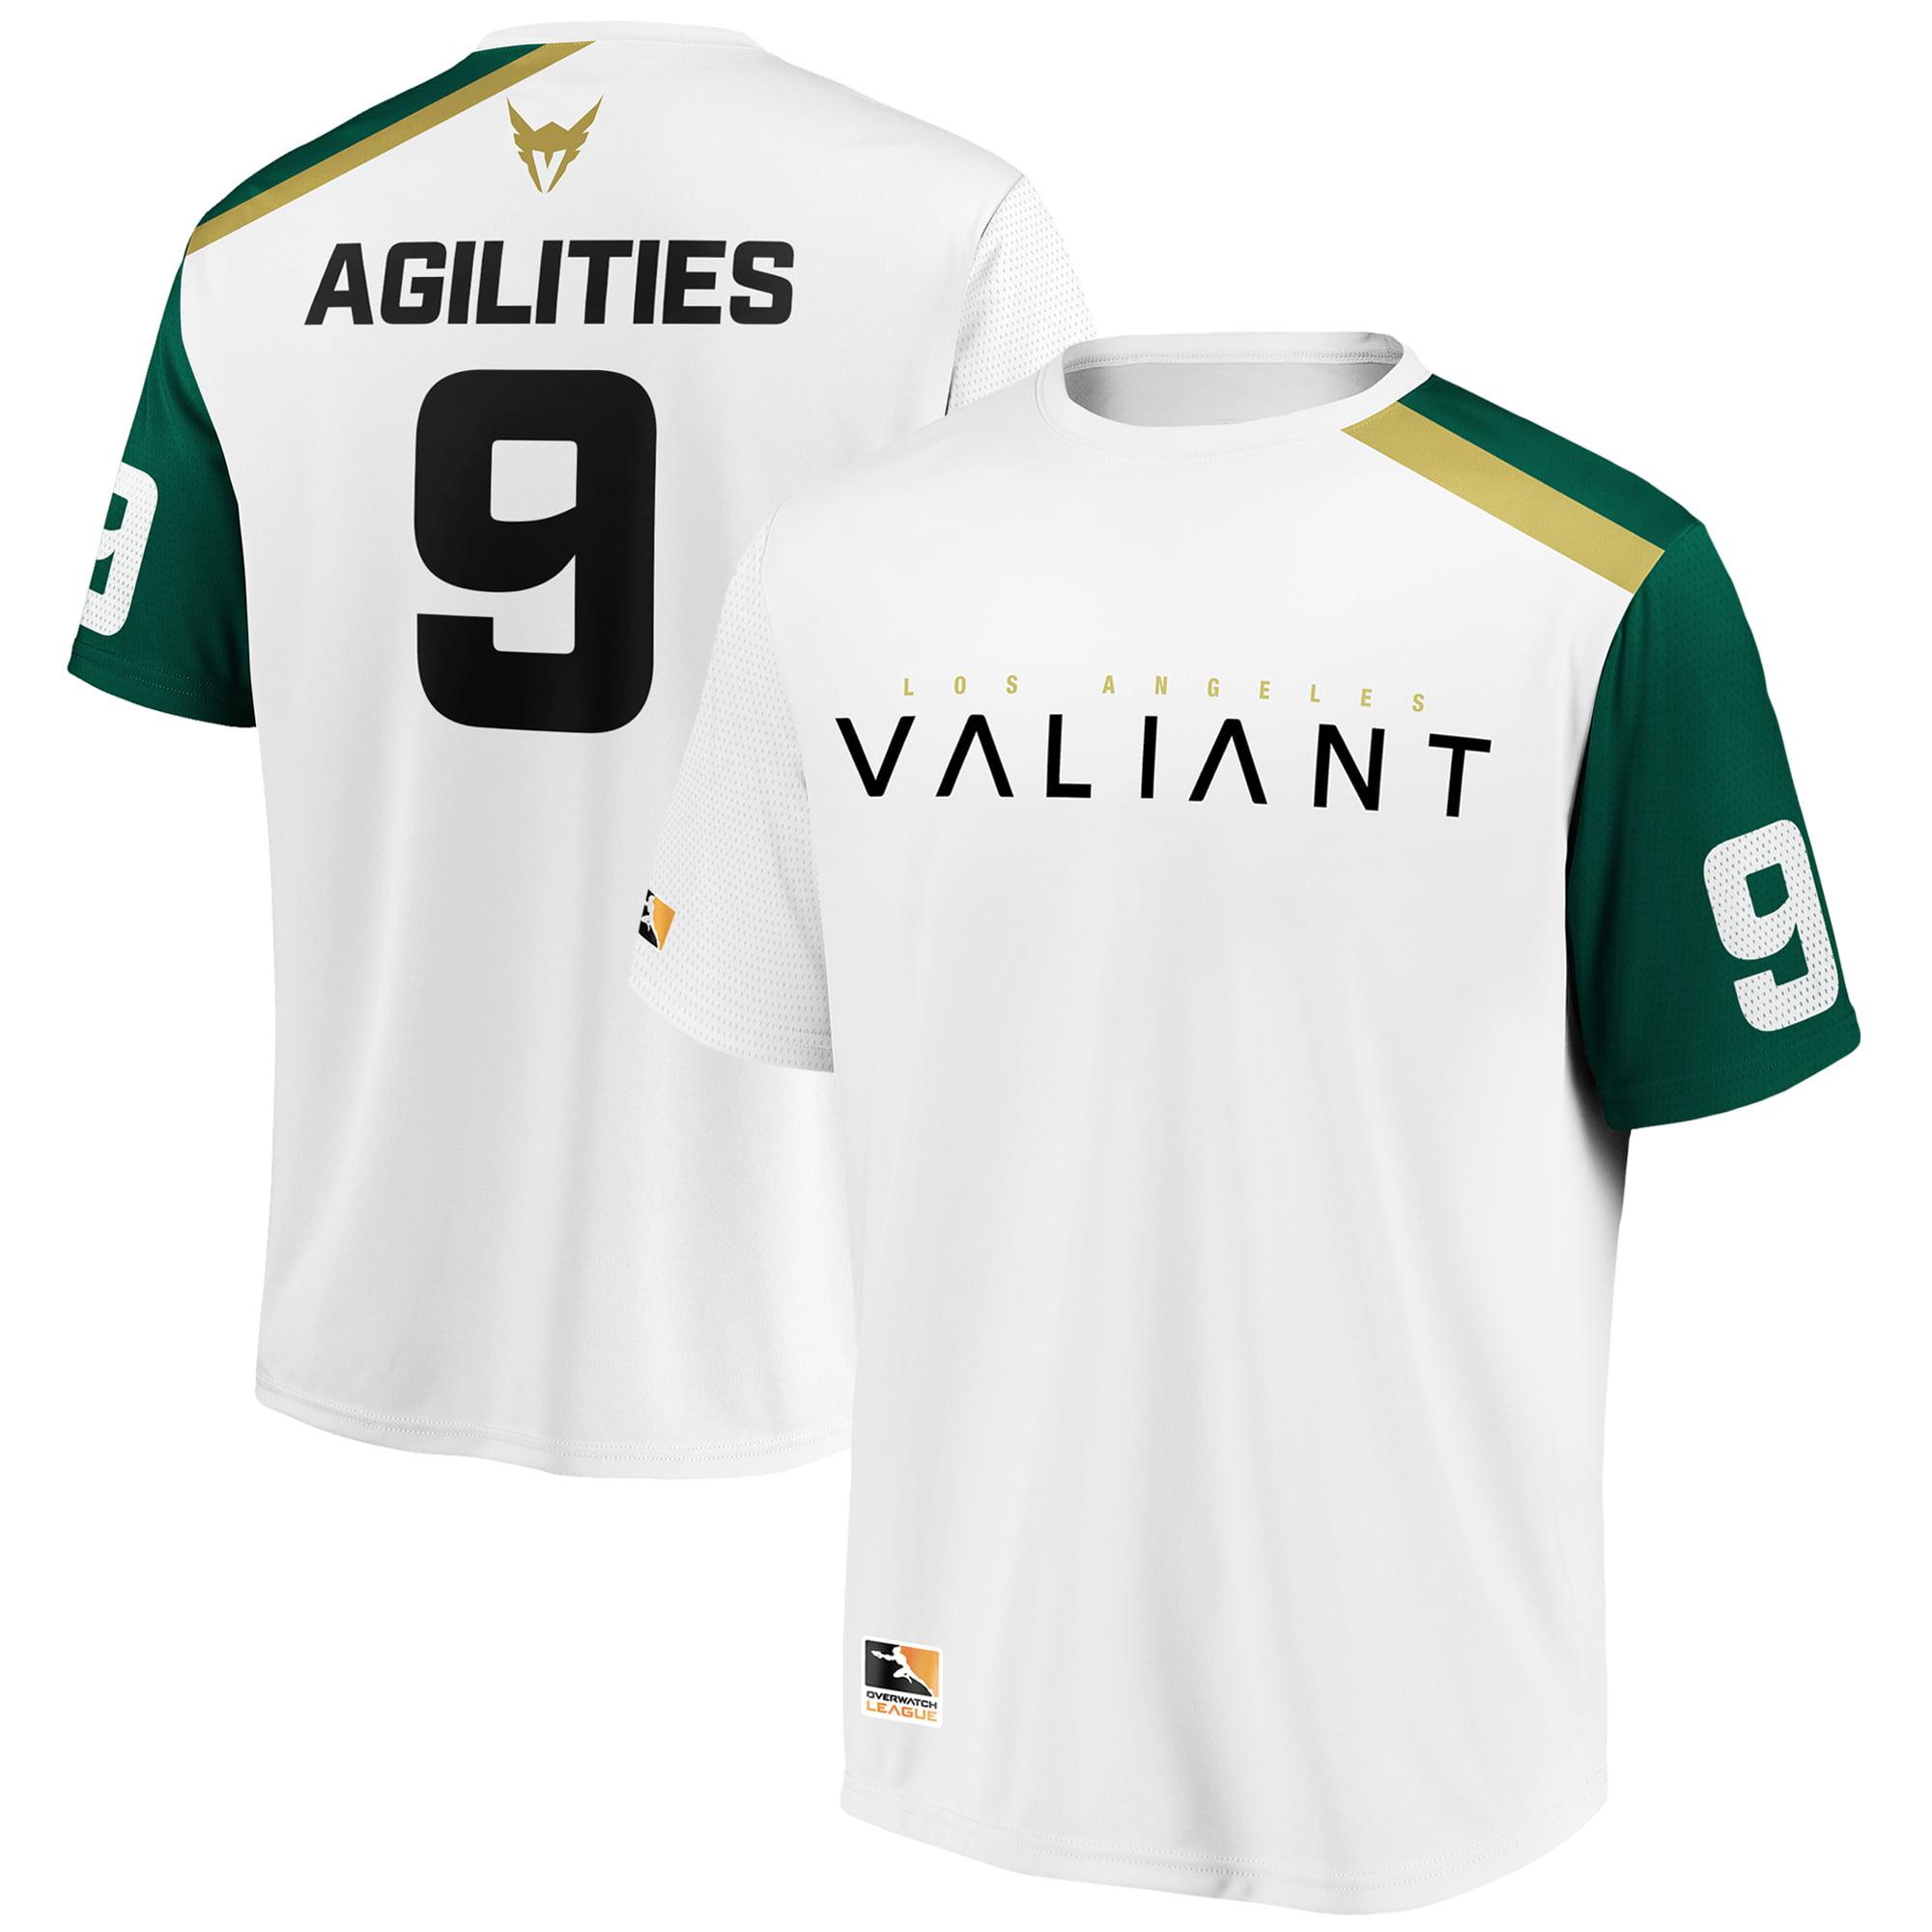 Agilities Los Angeles Valiant Overwatch League Replica Away Jersey - White